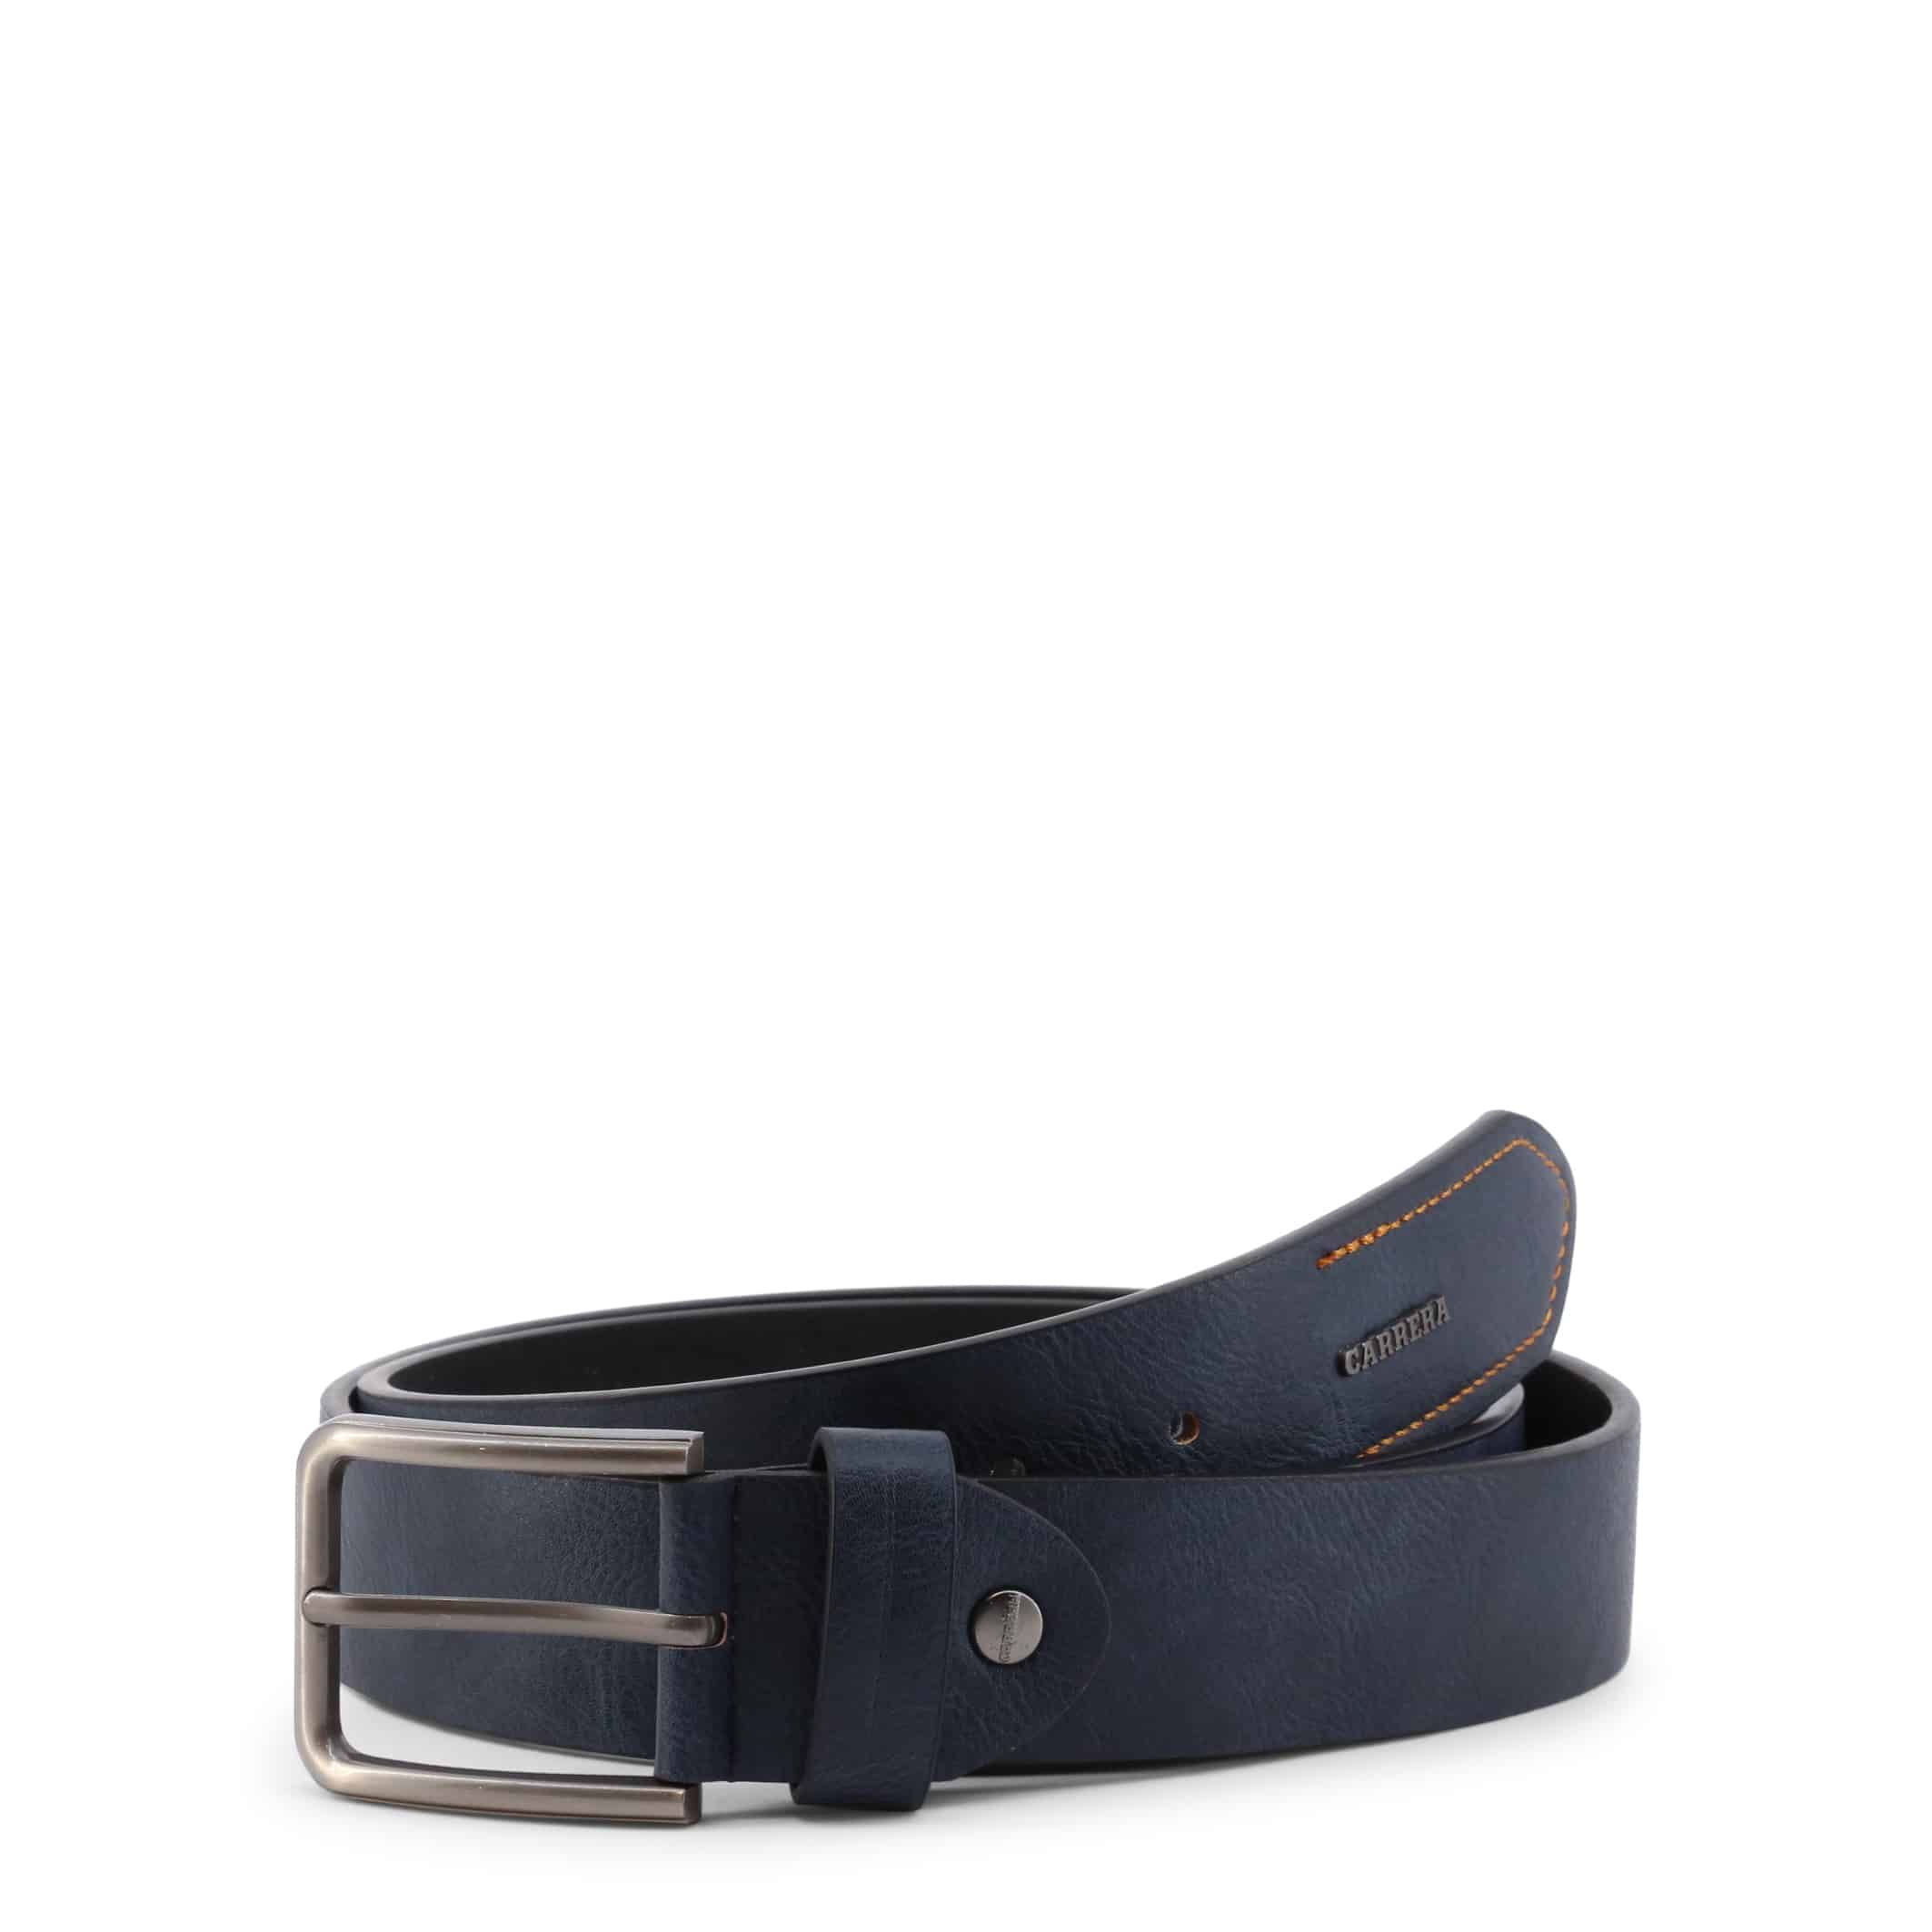 Carrera Jeans – CB5733 Designeritems.nl